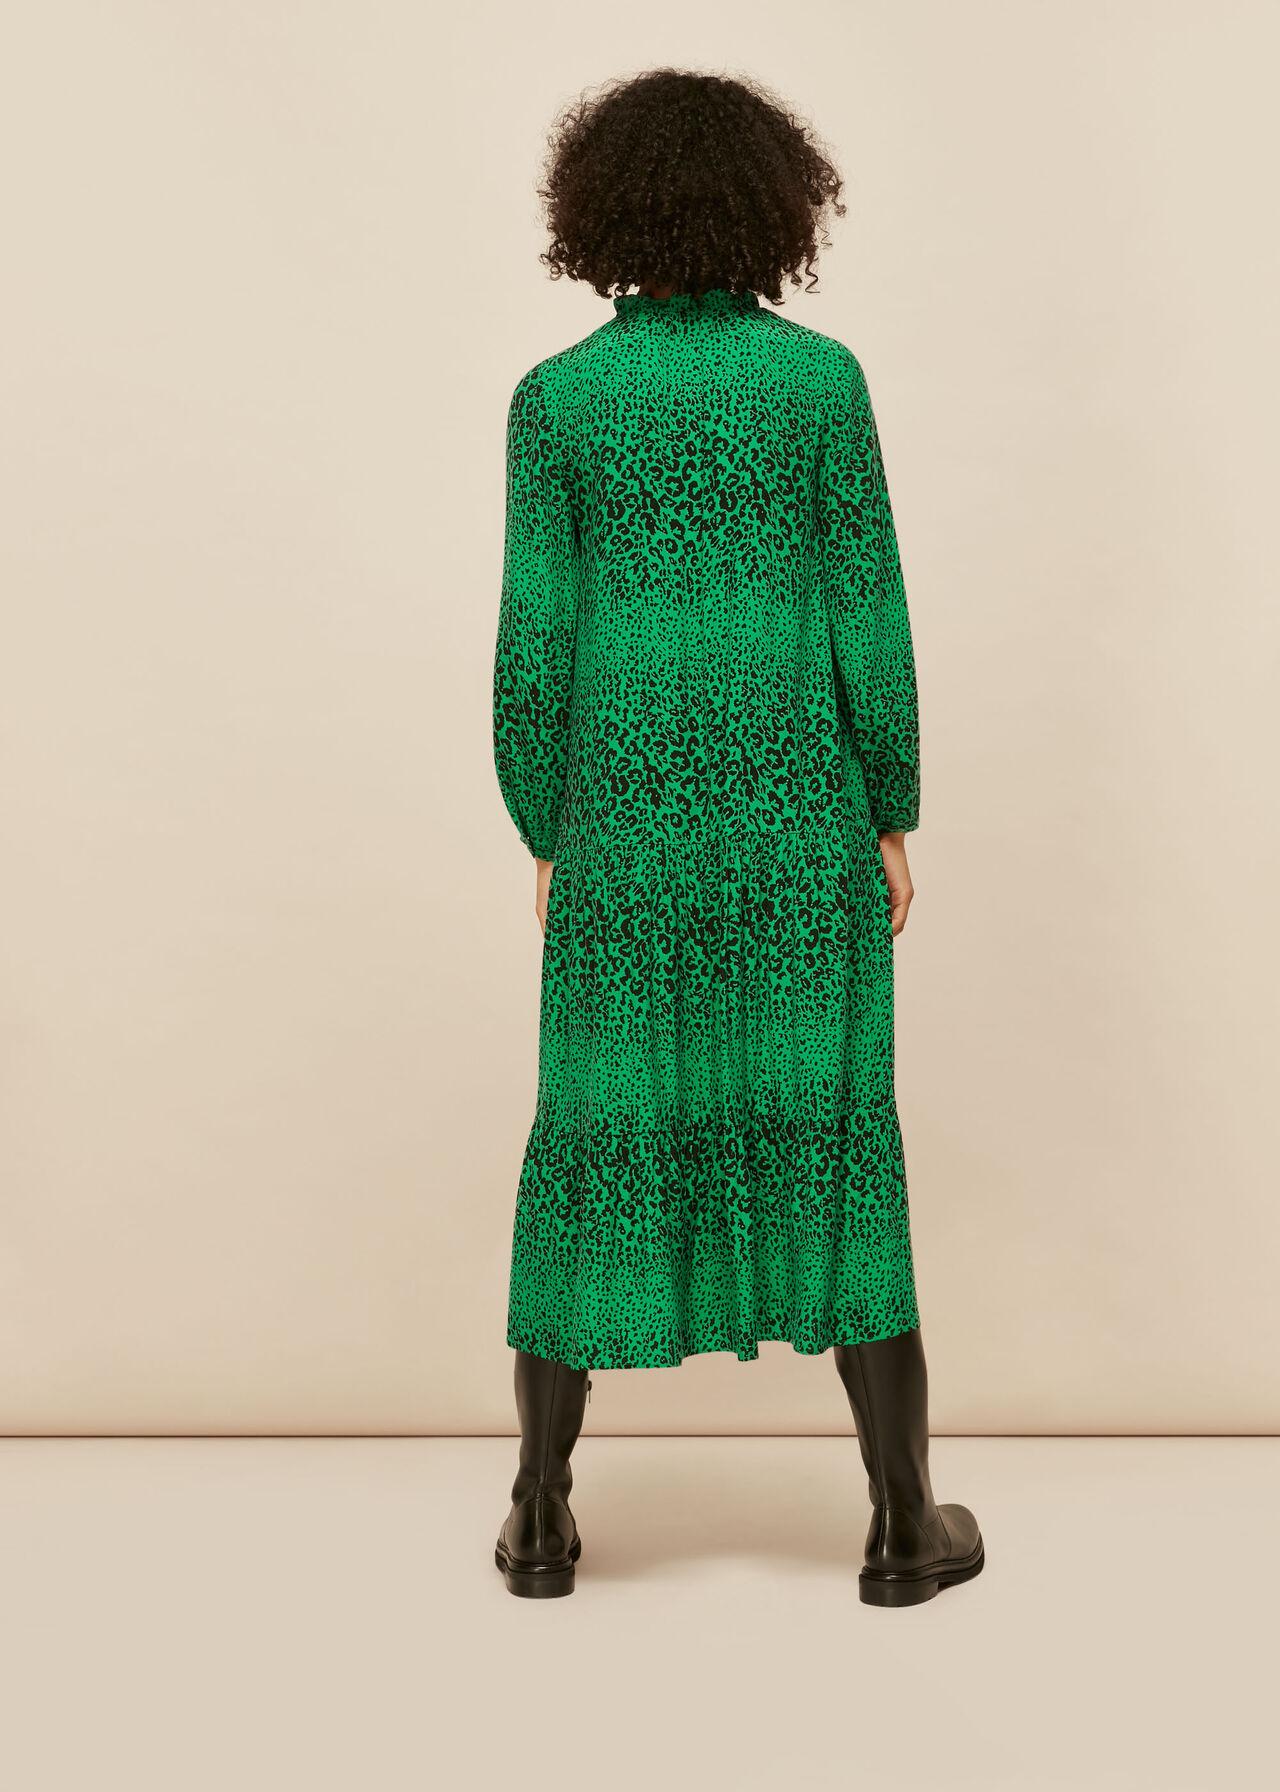 Speckled Animal Enora Dress